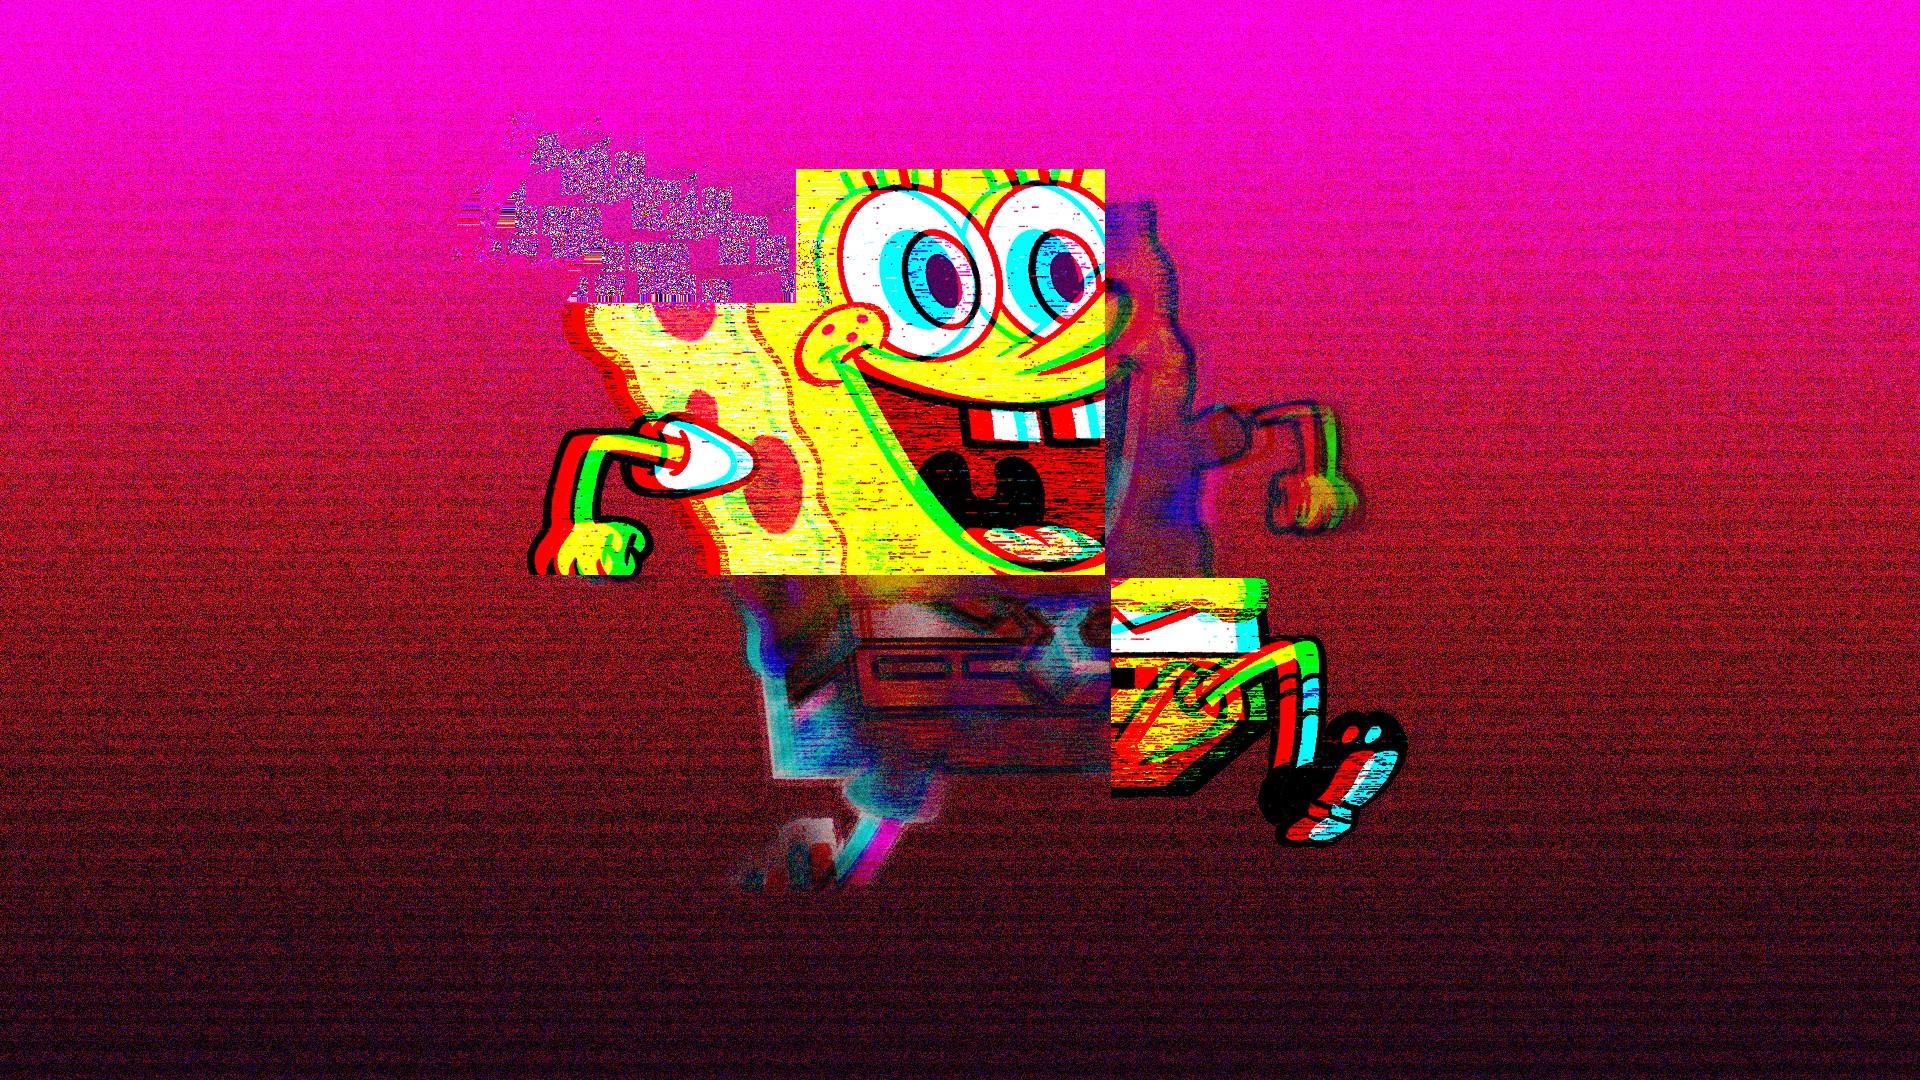 wallpaper vaporwave spongebob vhs run squarepants 1920x1080